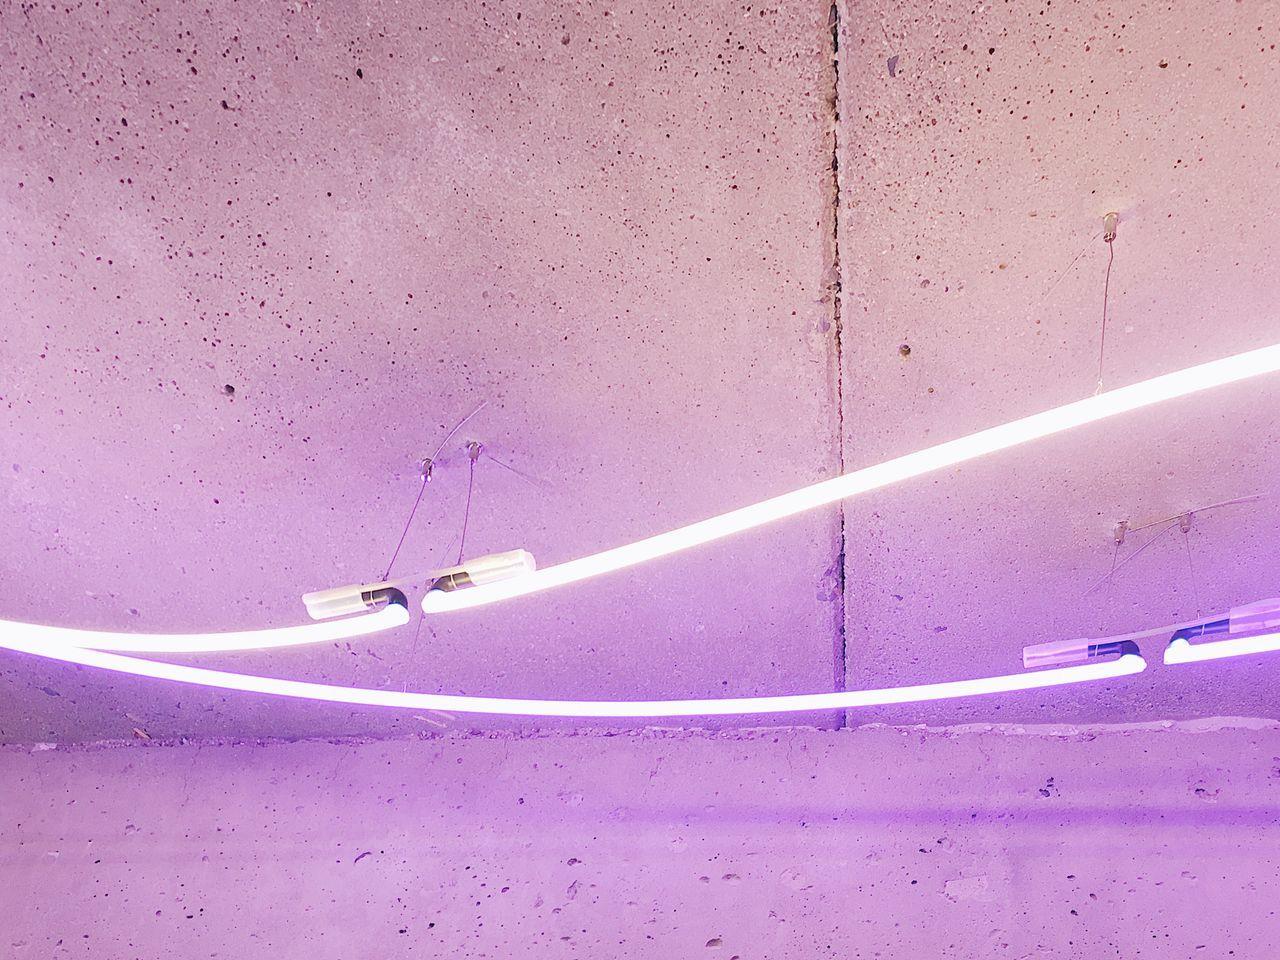 Berlin,  Electric Light,  Electricity,  Horizontal Image,  Lighting Equipment